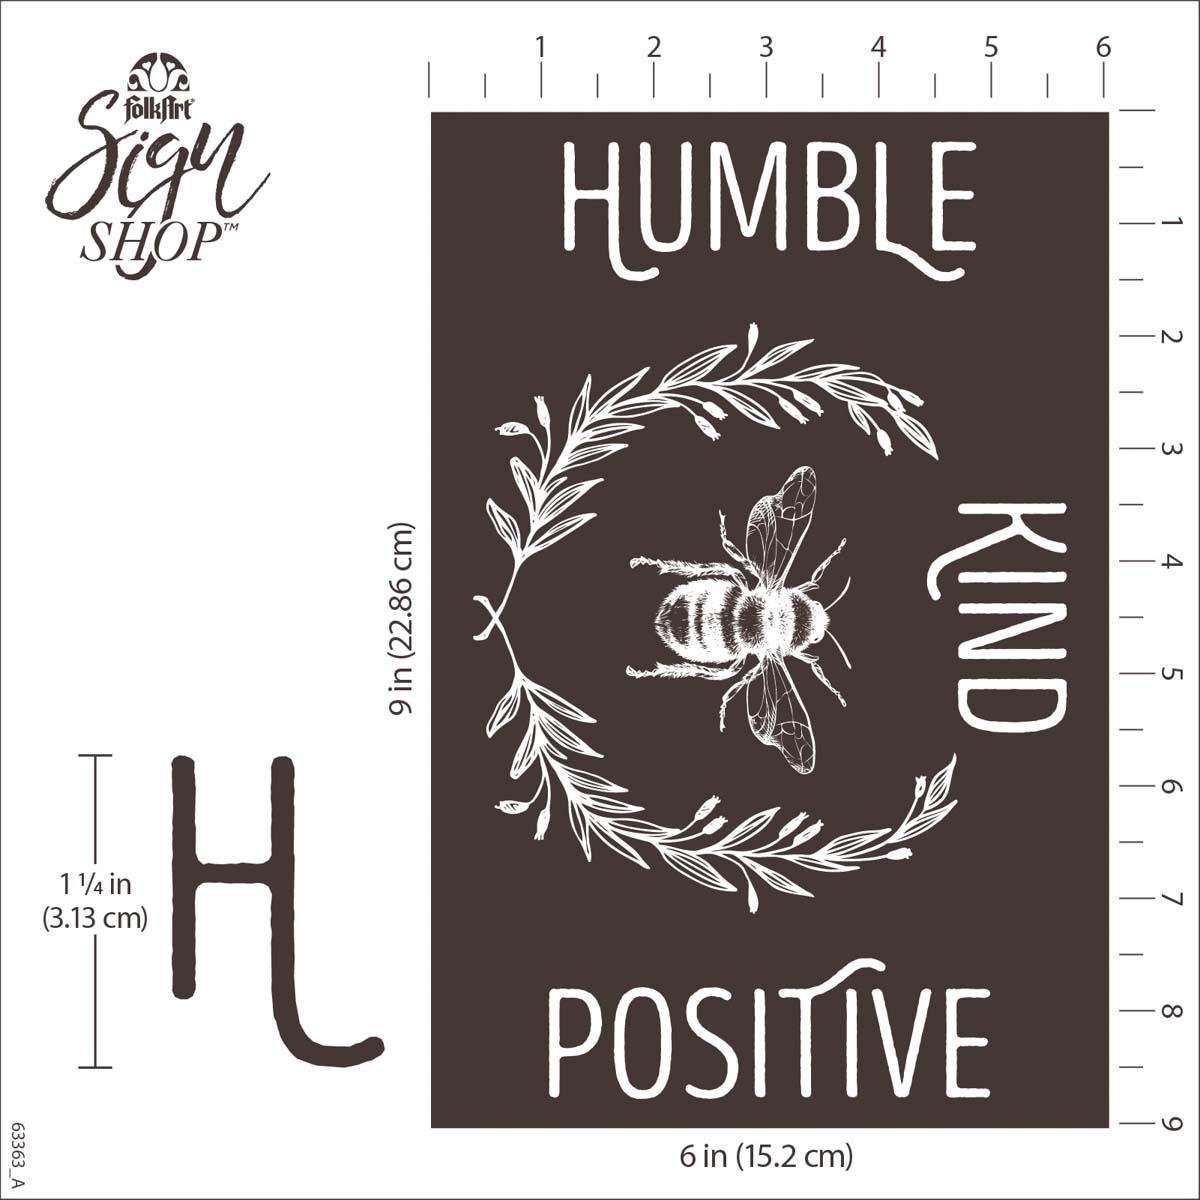 FolkArt ® Sign Shop™ Mesh Stencil - Humble Hive, 2 pc. - 63363